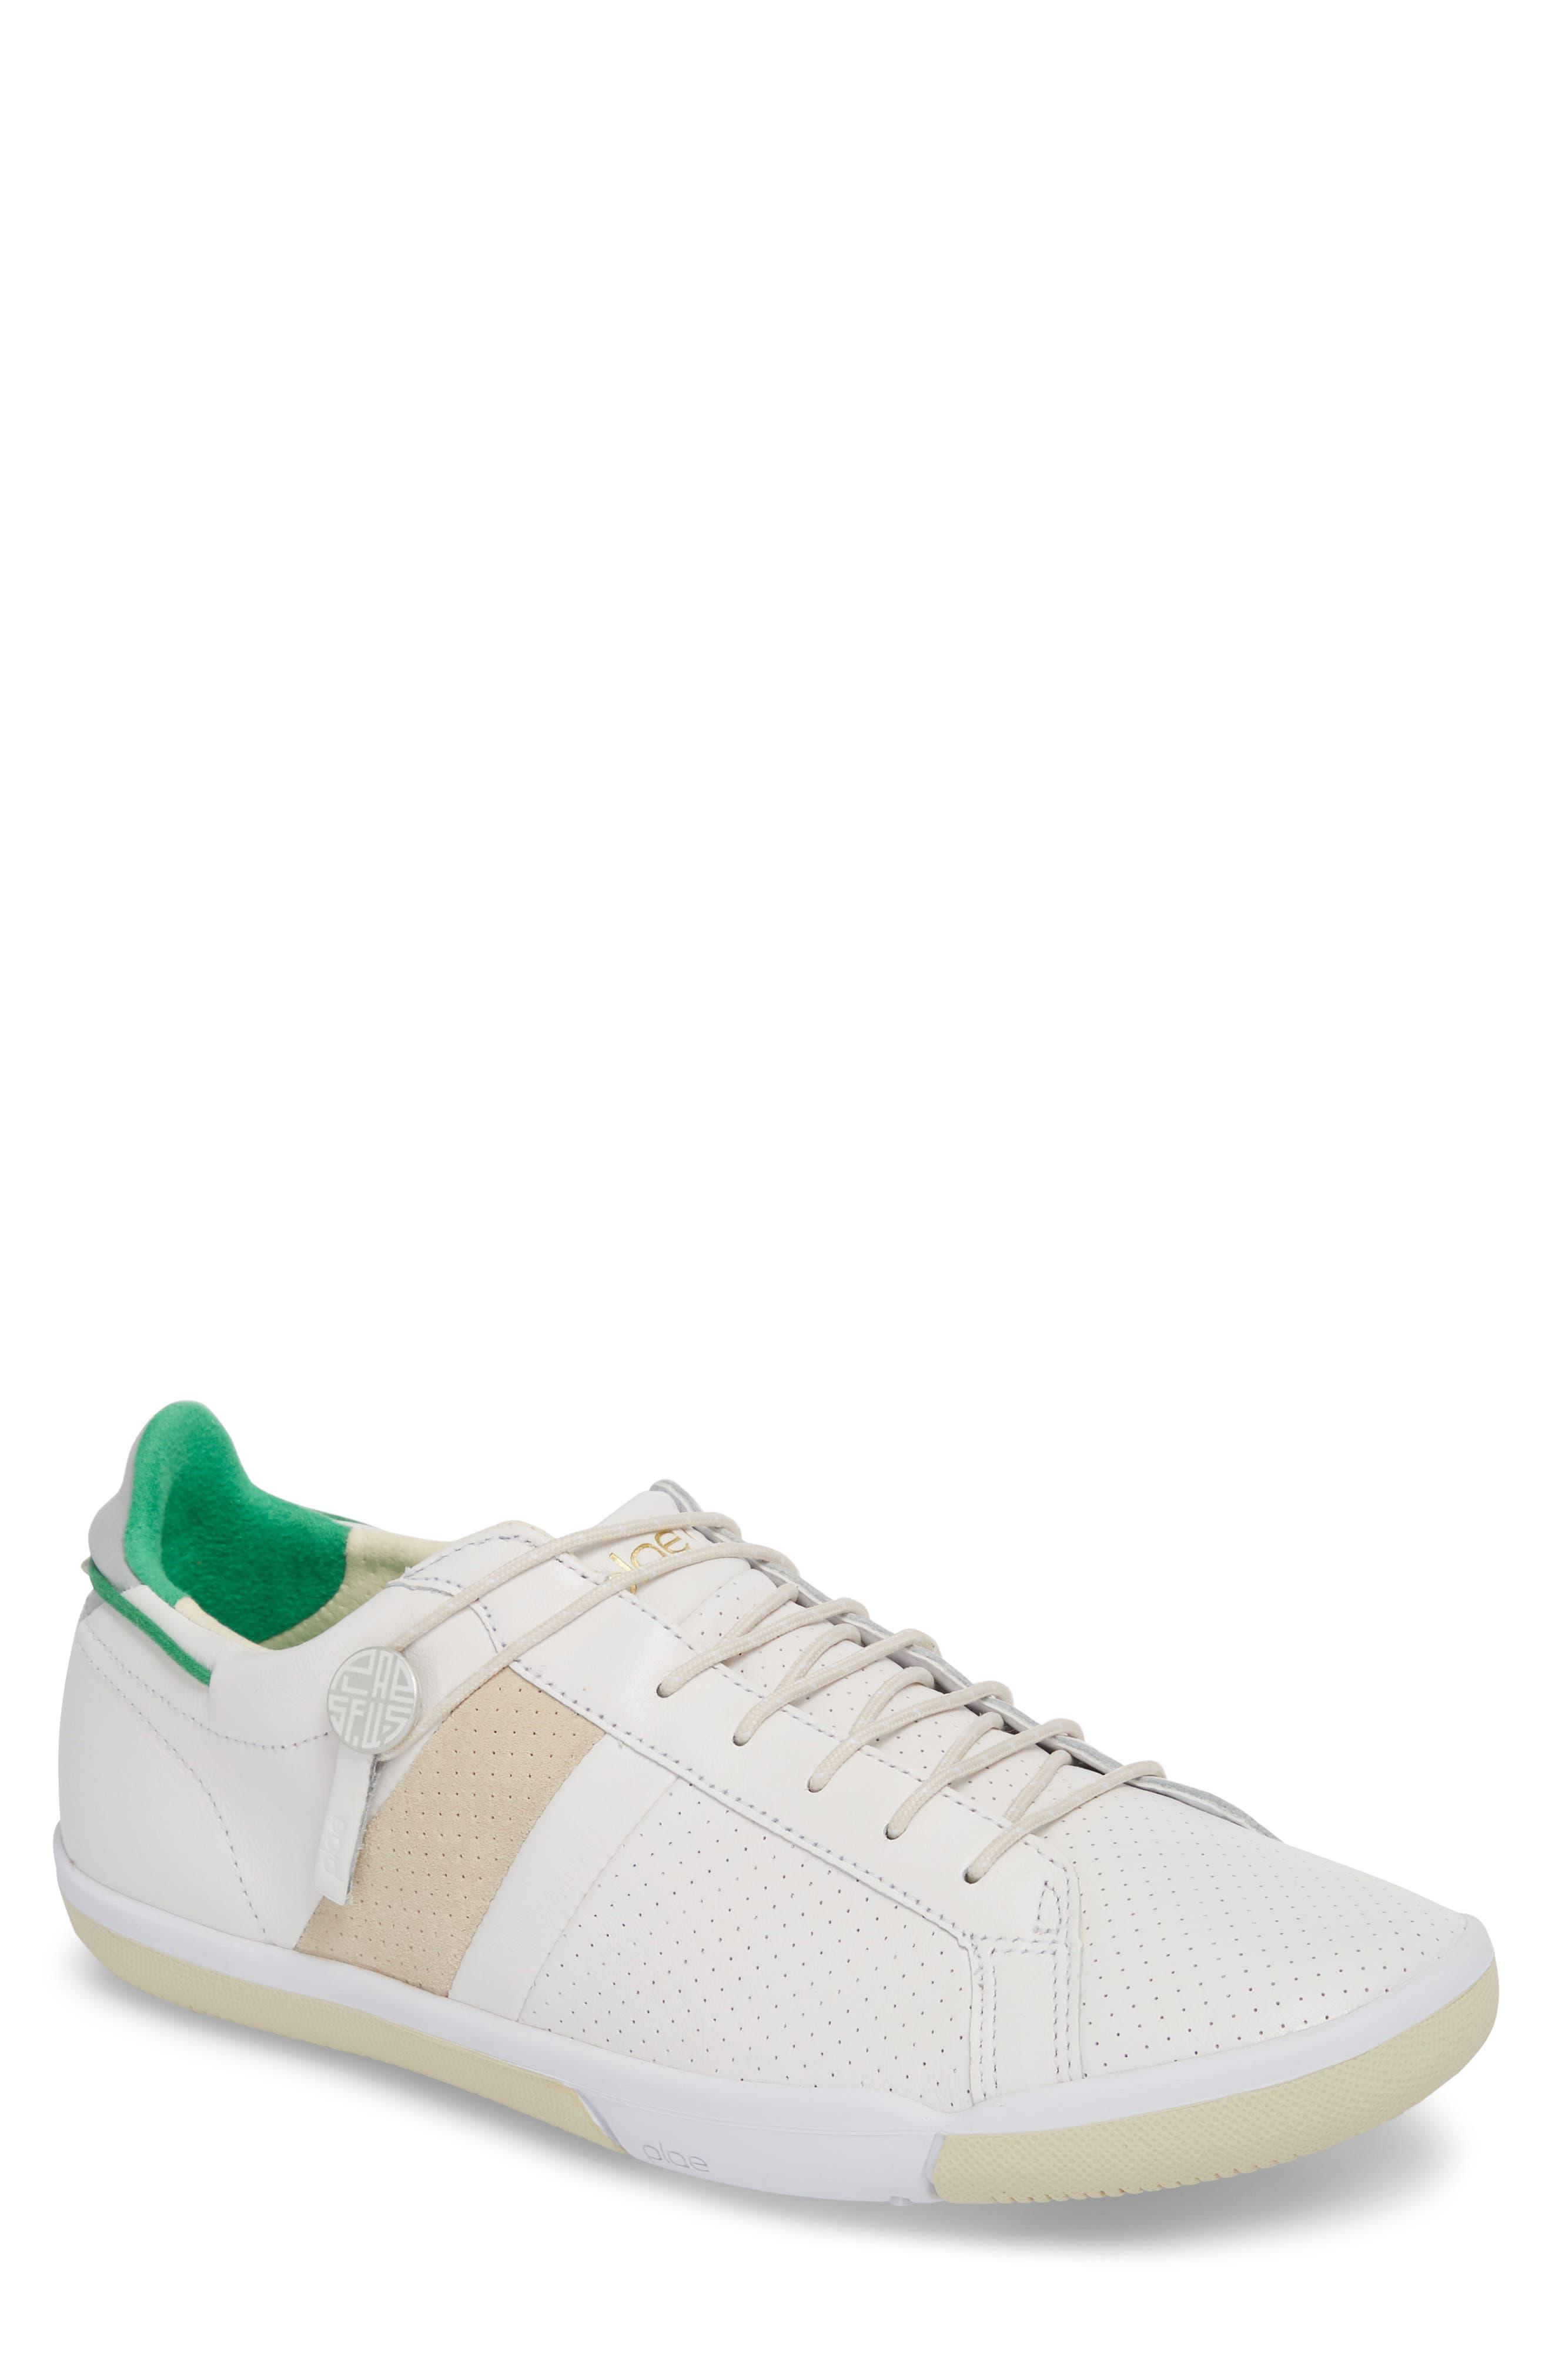 Alternate Image 1 Selected - PLAE Mulberry Low Top Sneaker (Men)